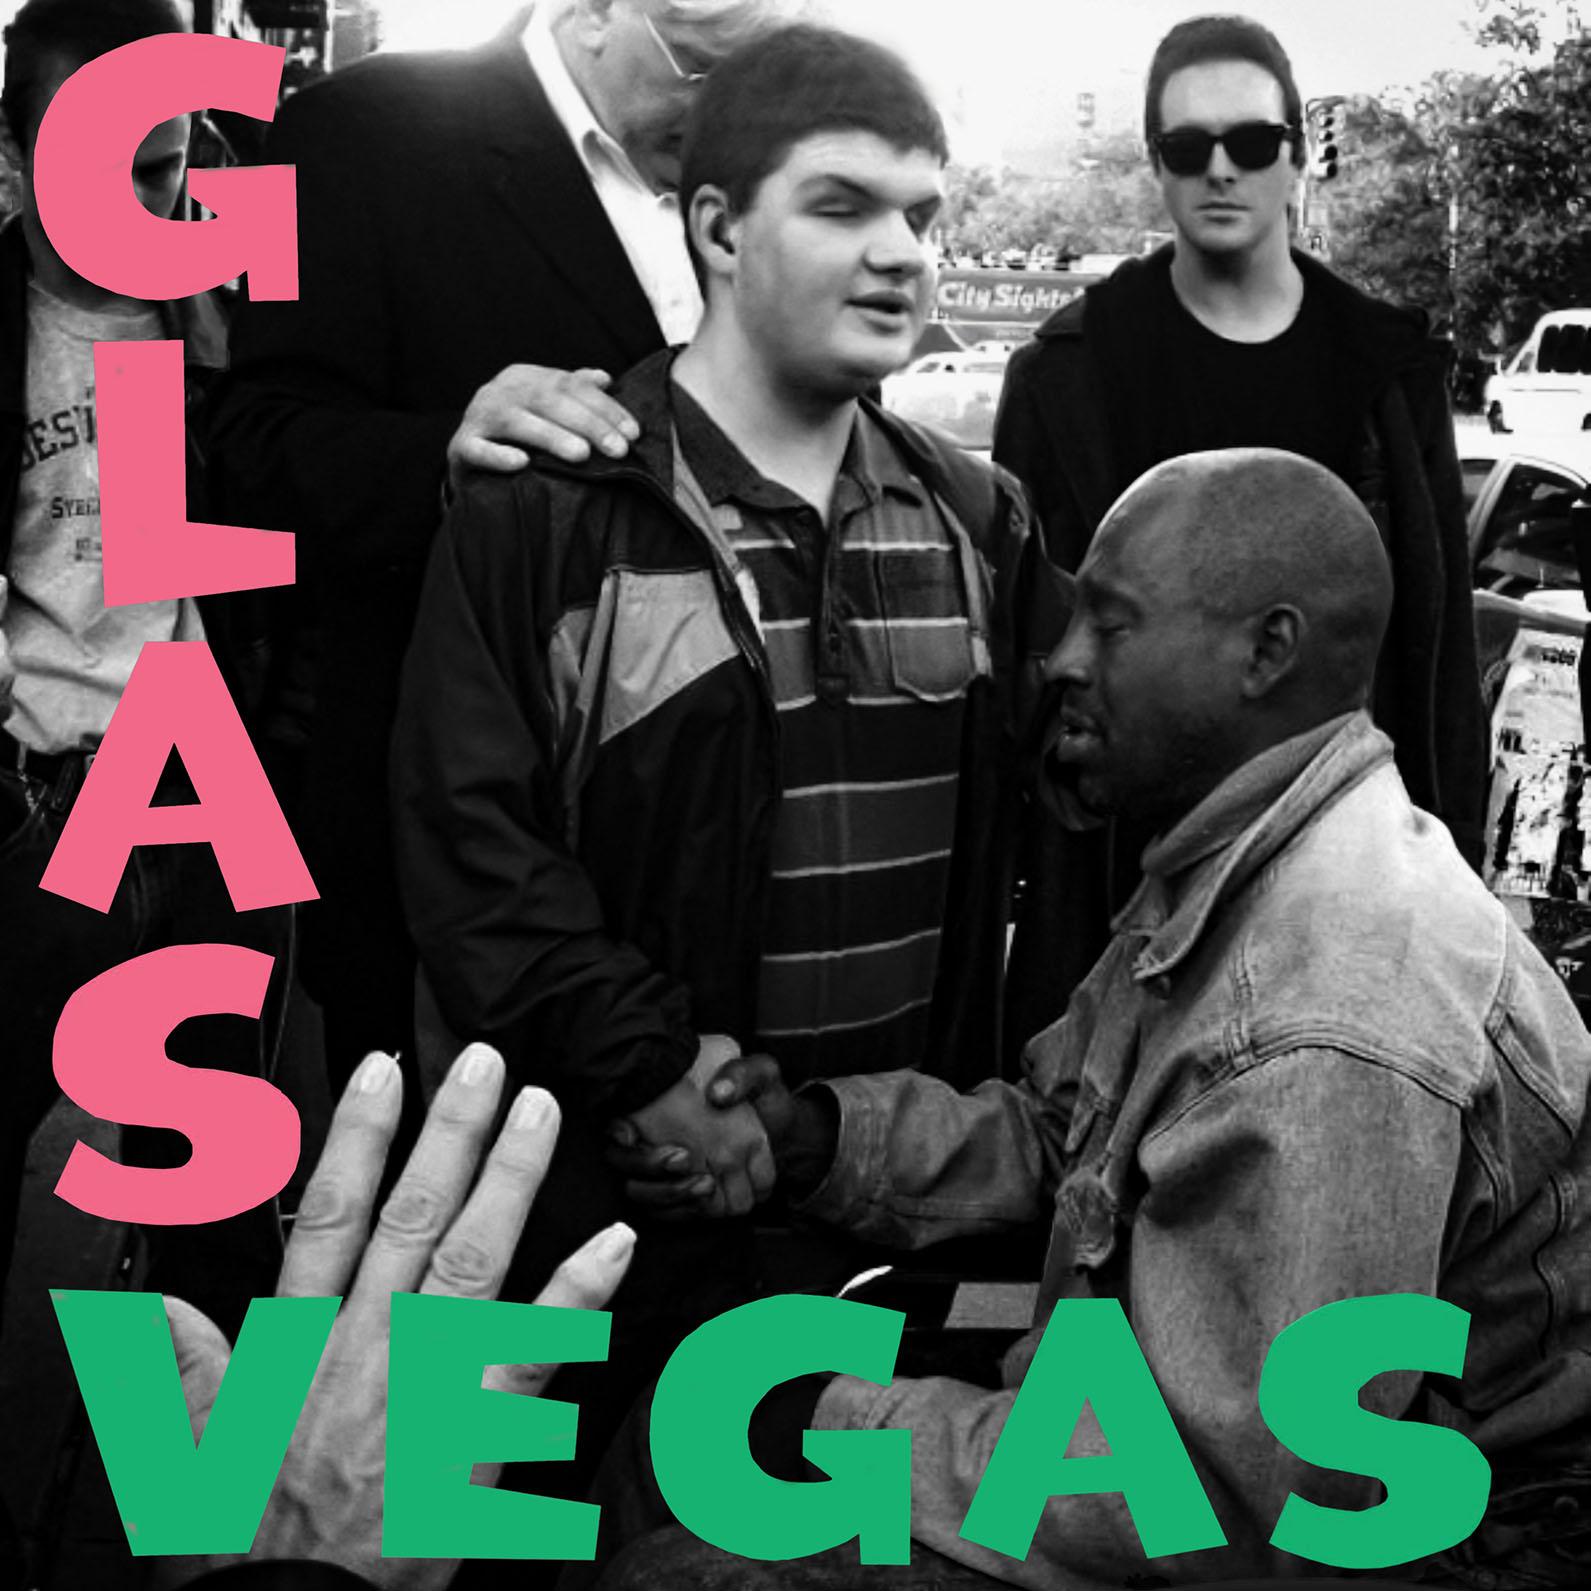 GLASVEGAS return with new album 'Godspeed' - Listen to new single 'Shake The Cage (für Theo)'